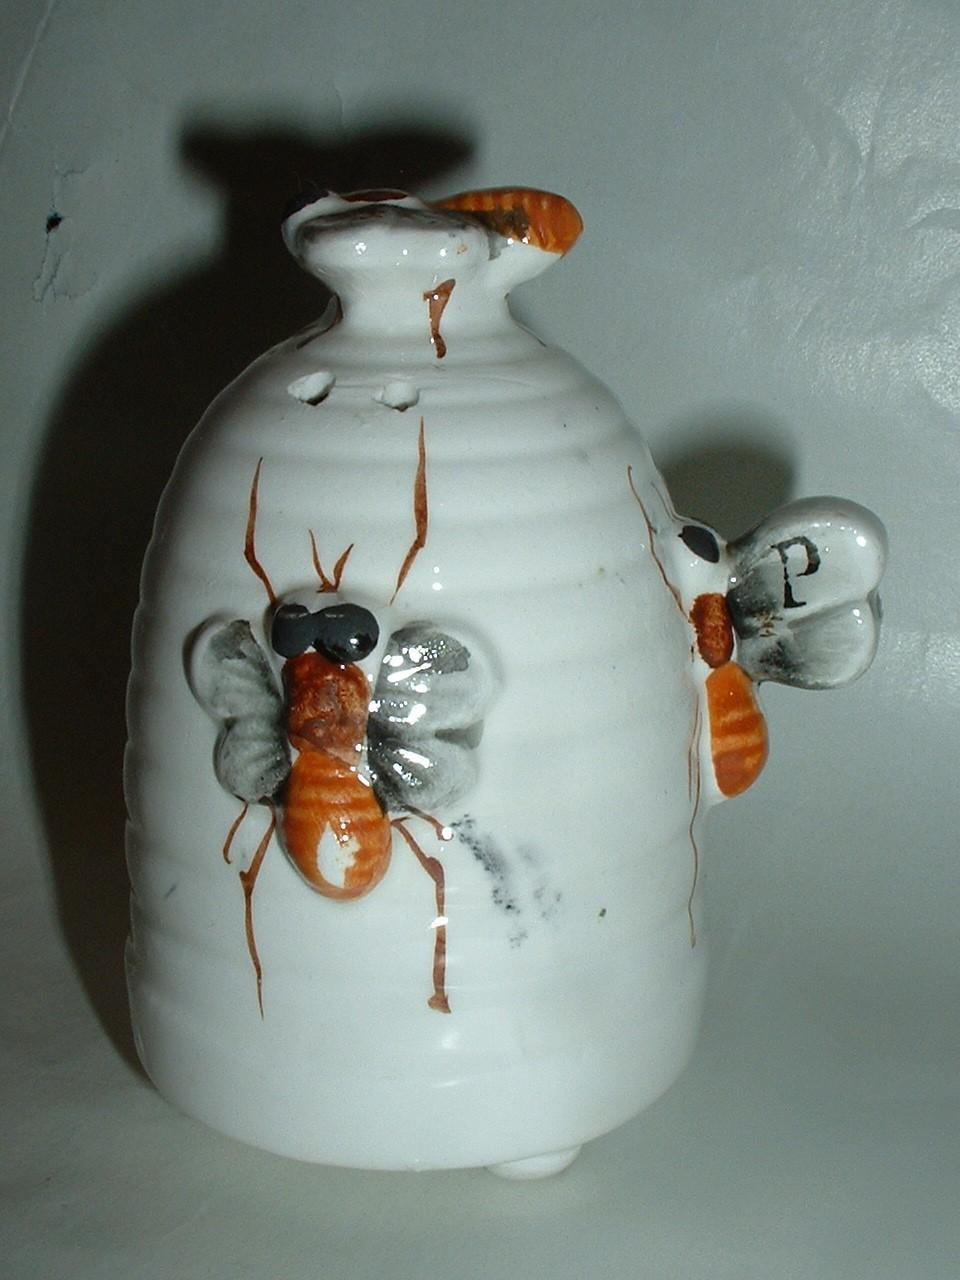 Vintage Bee Hive Salt and Pepper Sakers